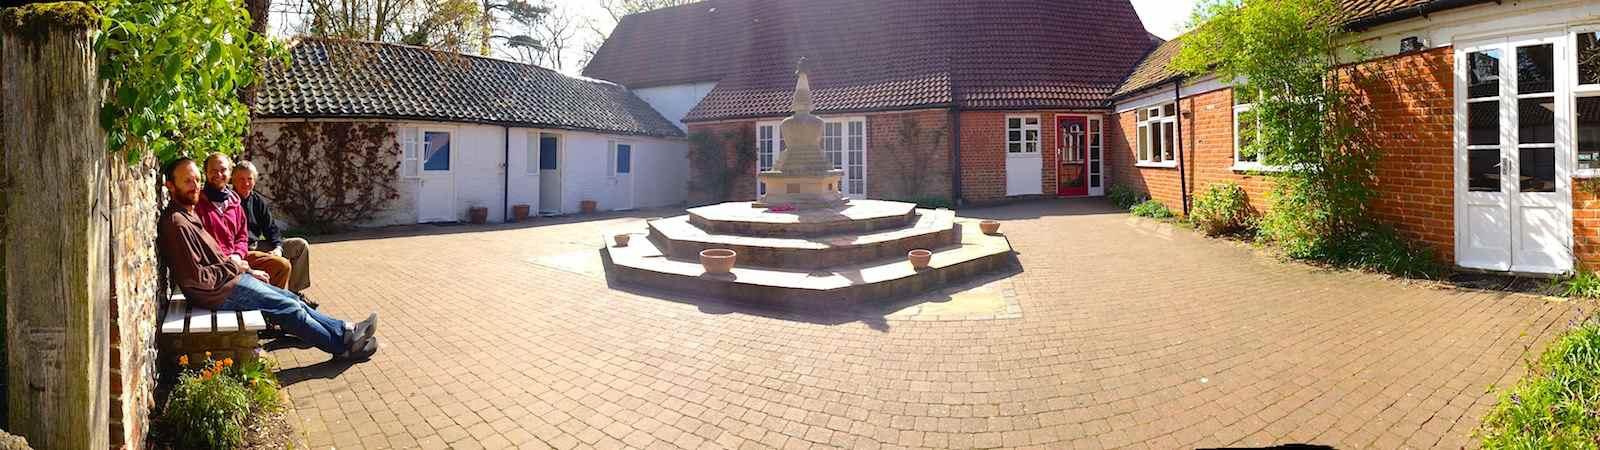 The Stupa courtyad